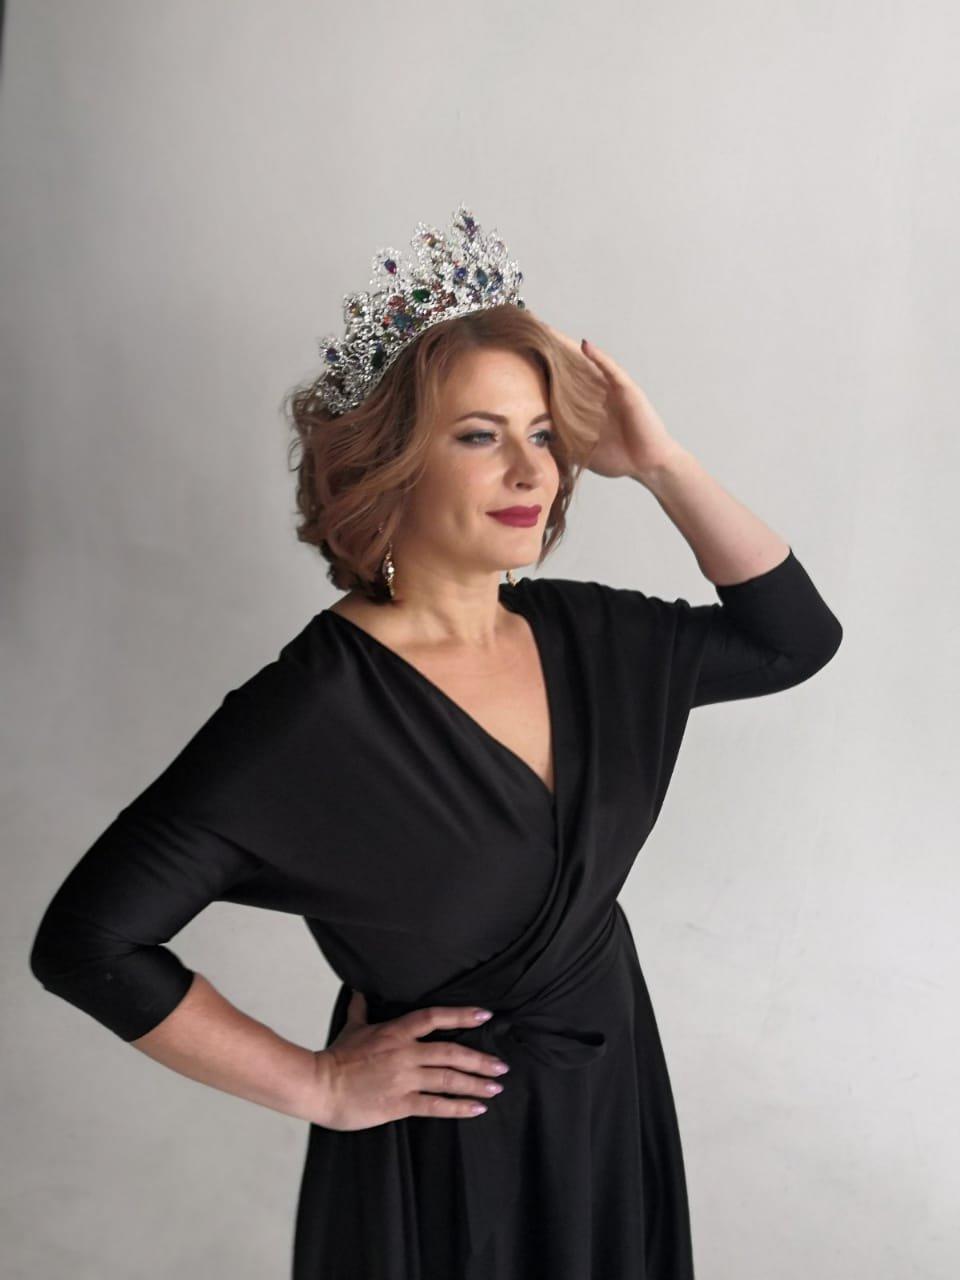 Путана Катя Марина, 22 года, метро Царицыно